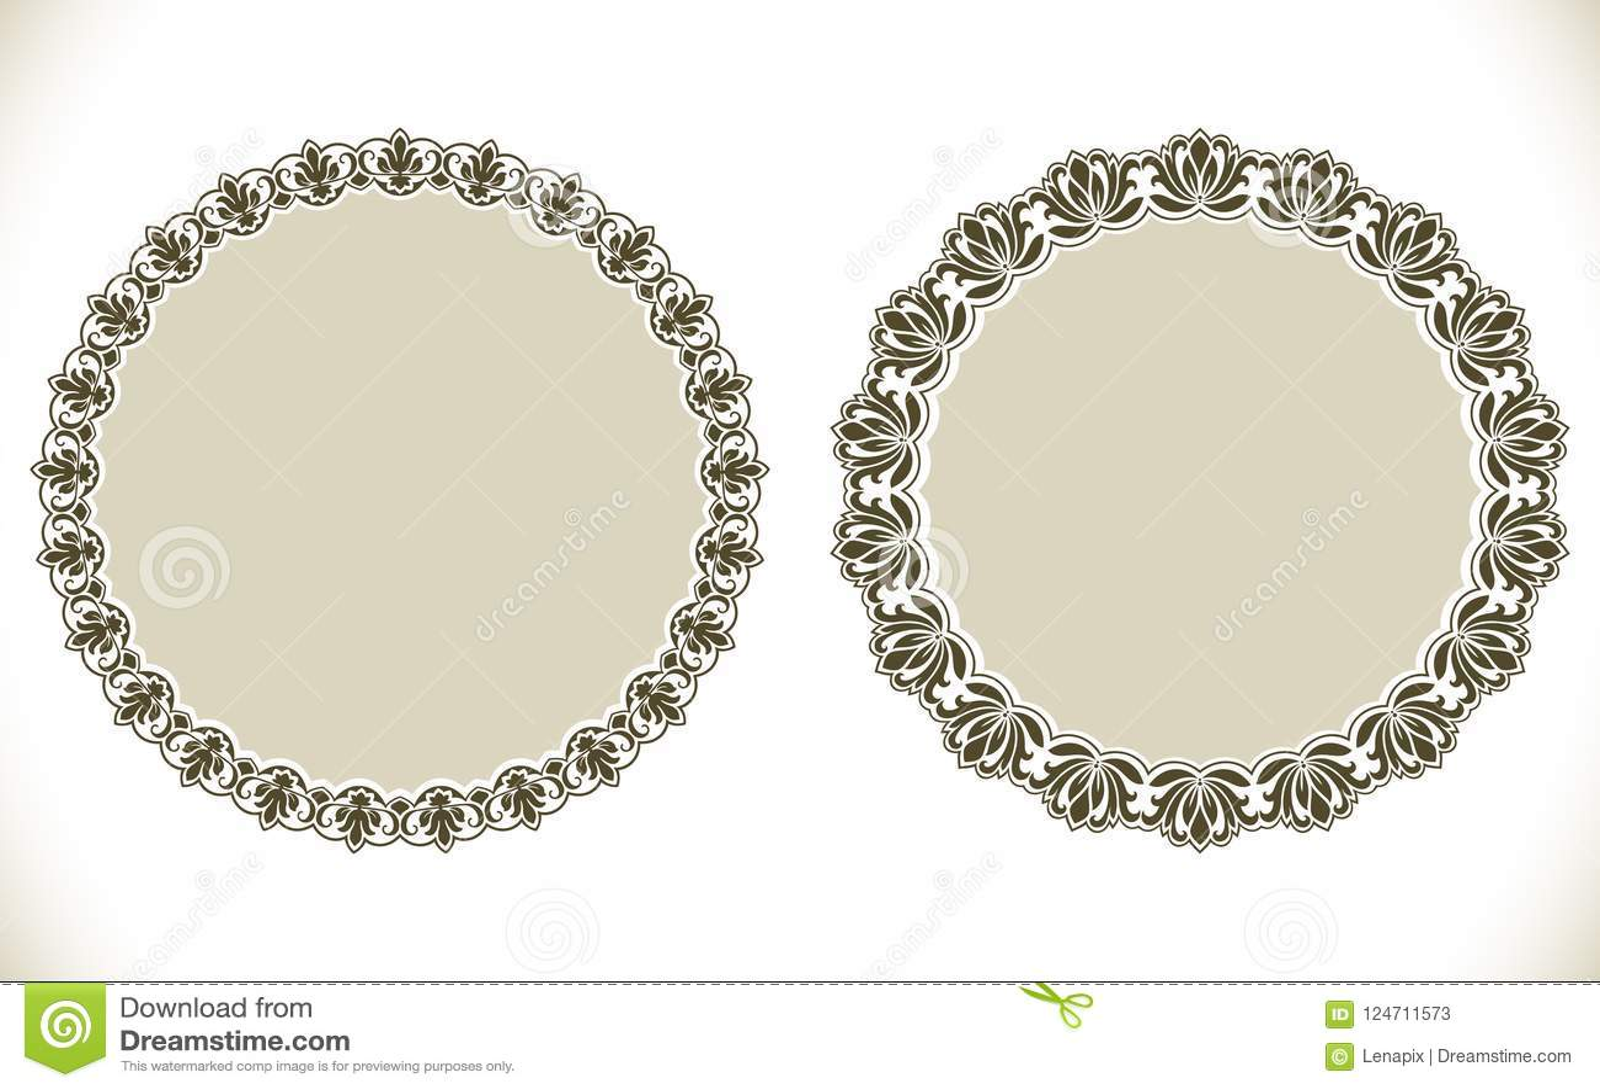 Vintage Decorative Round Frames Stock Vector - Illustration of ...